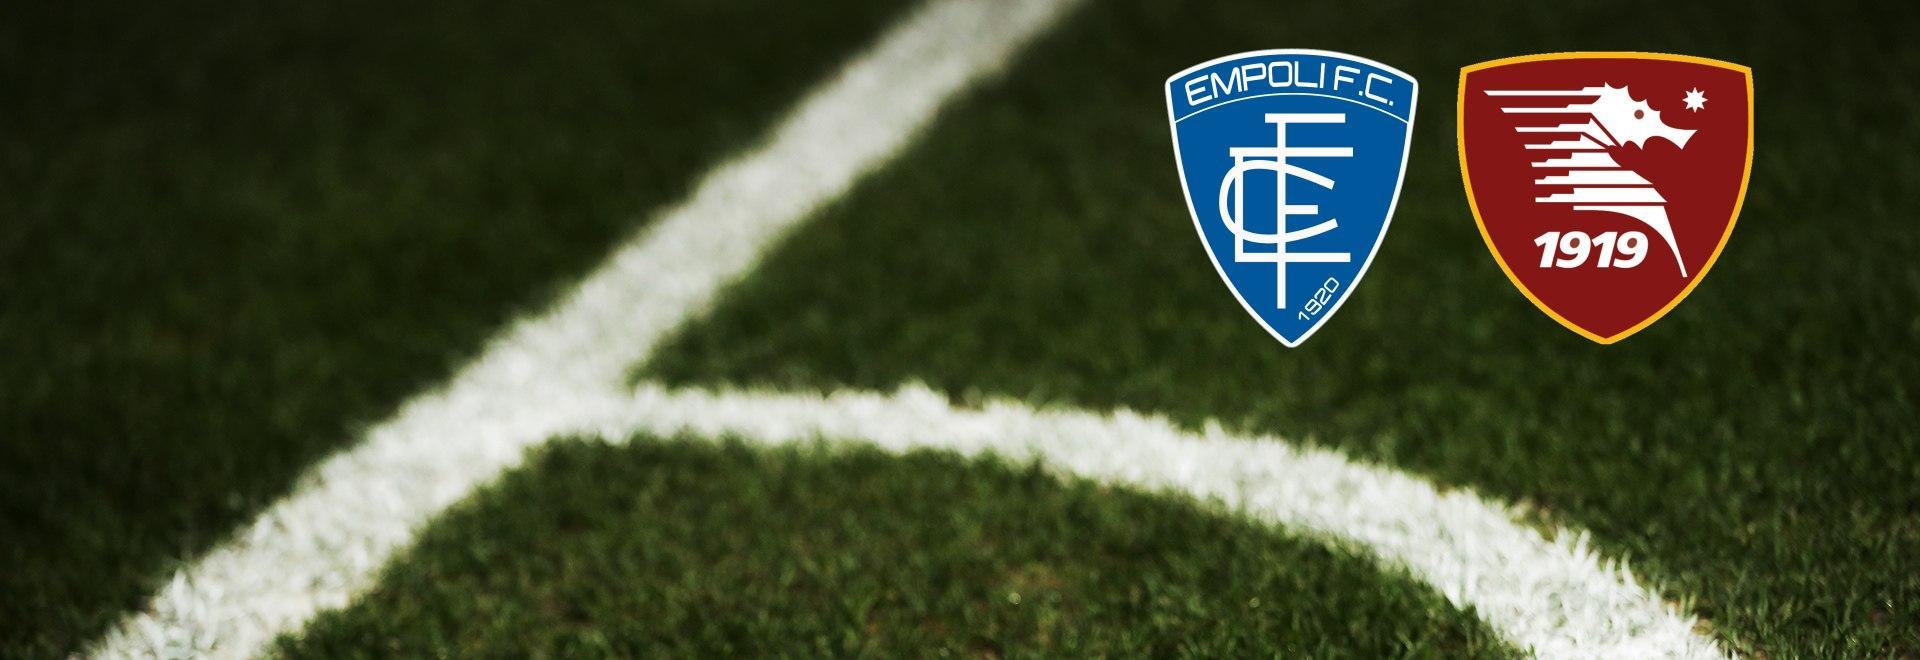 Empoli - Salernitana. 17a g.